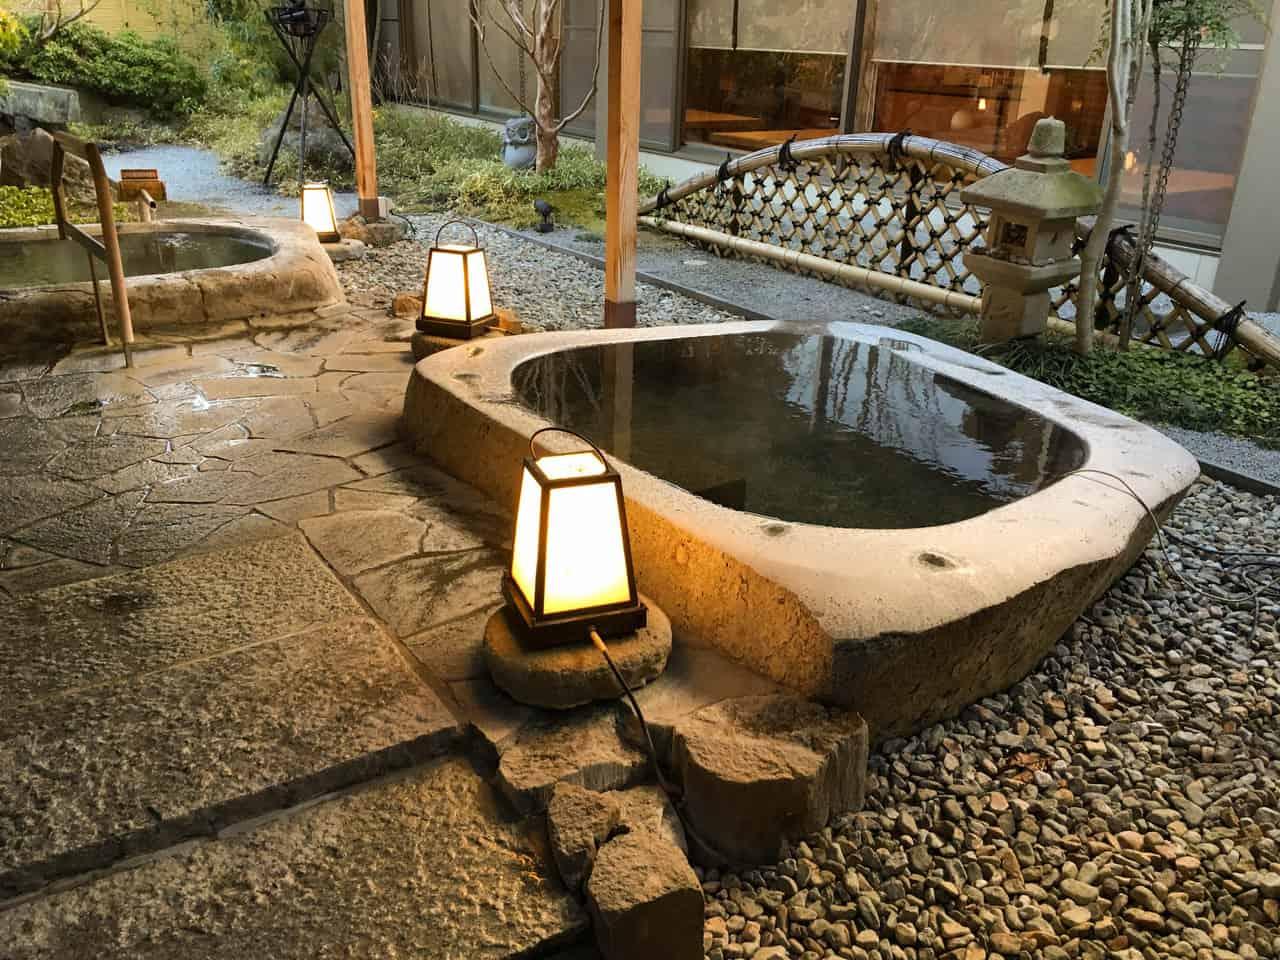 Yahata-ya: Come Stay at this Renowned Japanese Resort